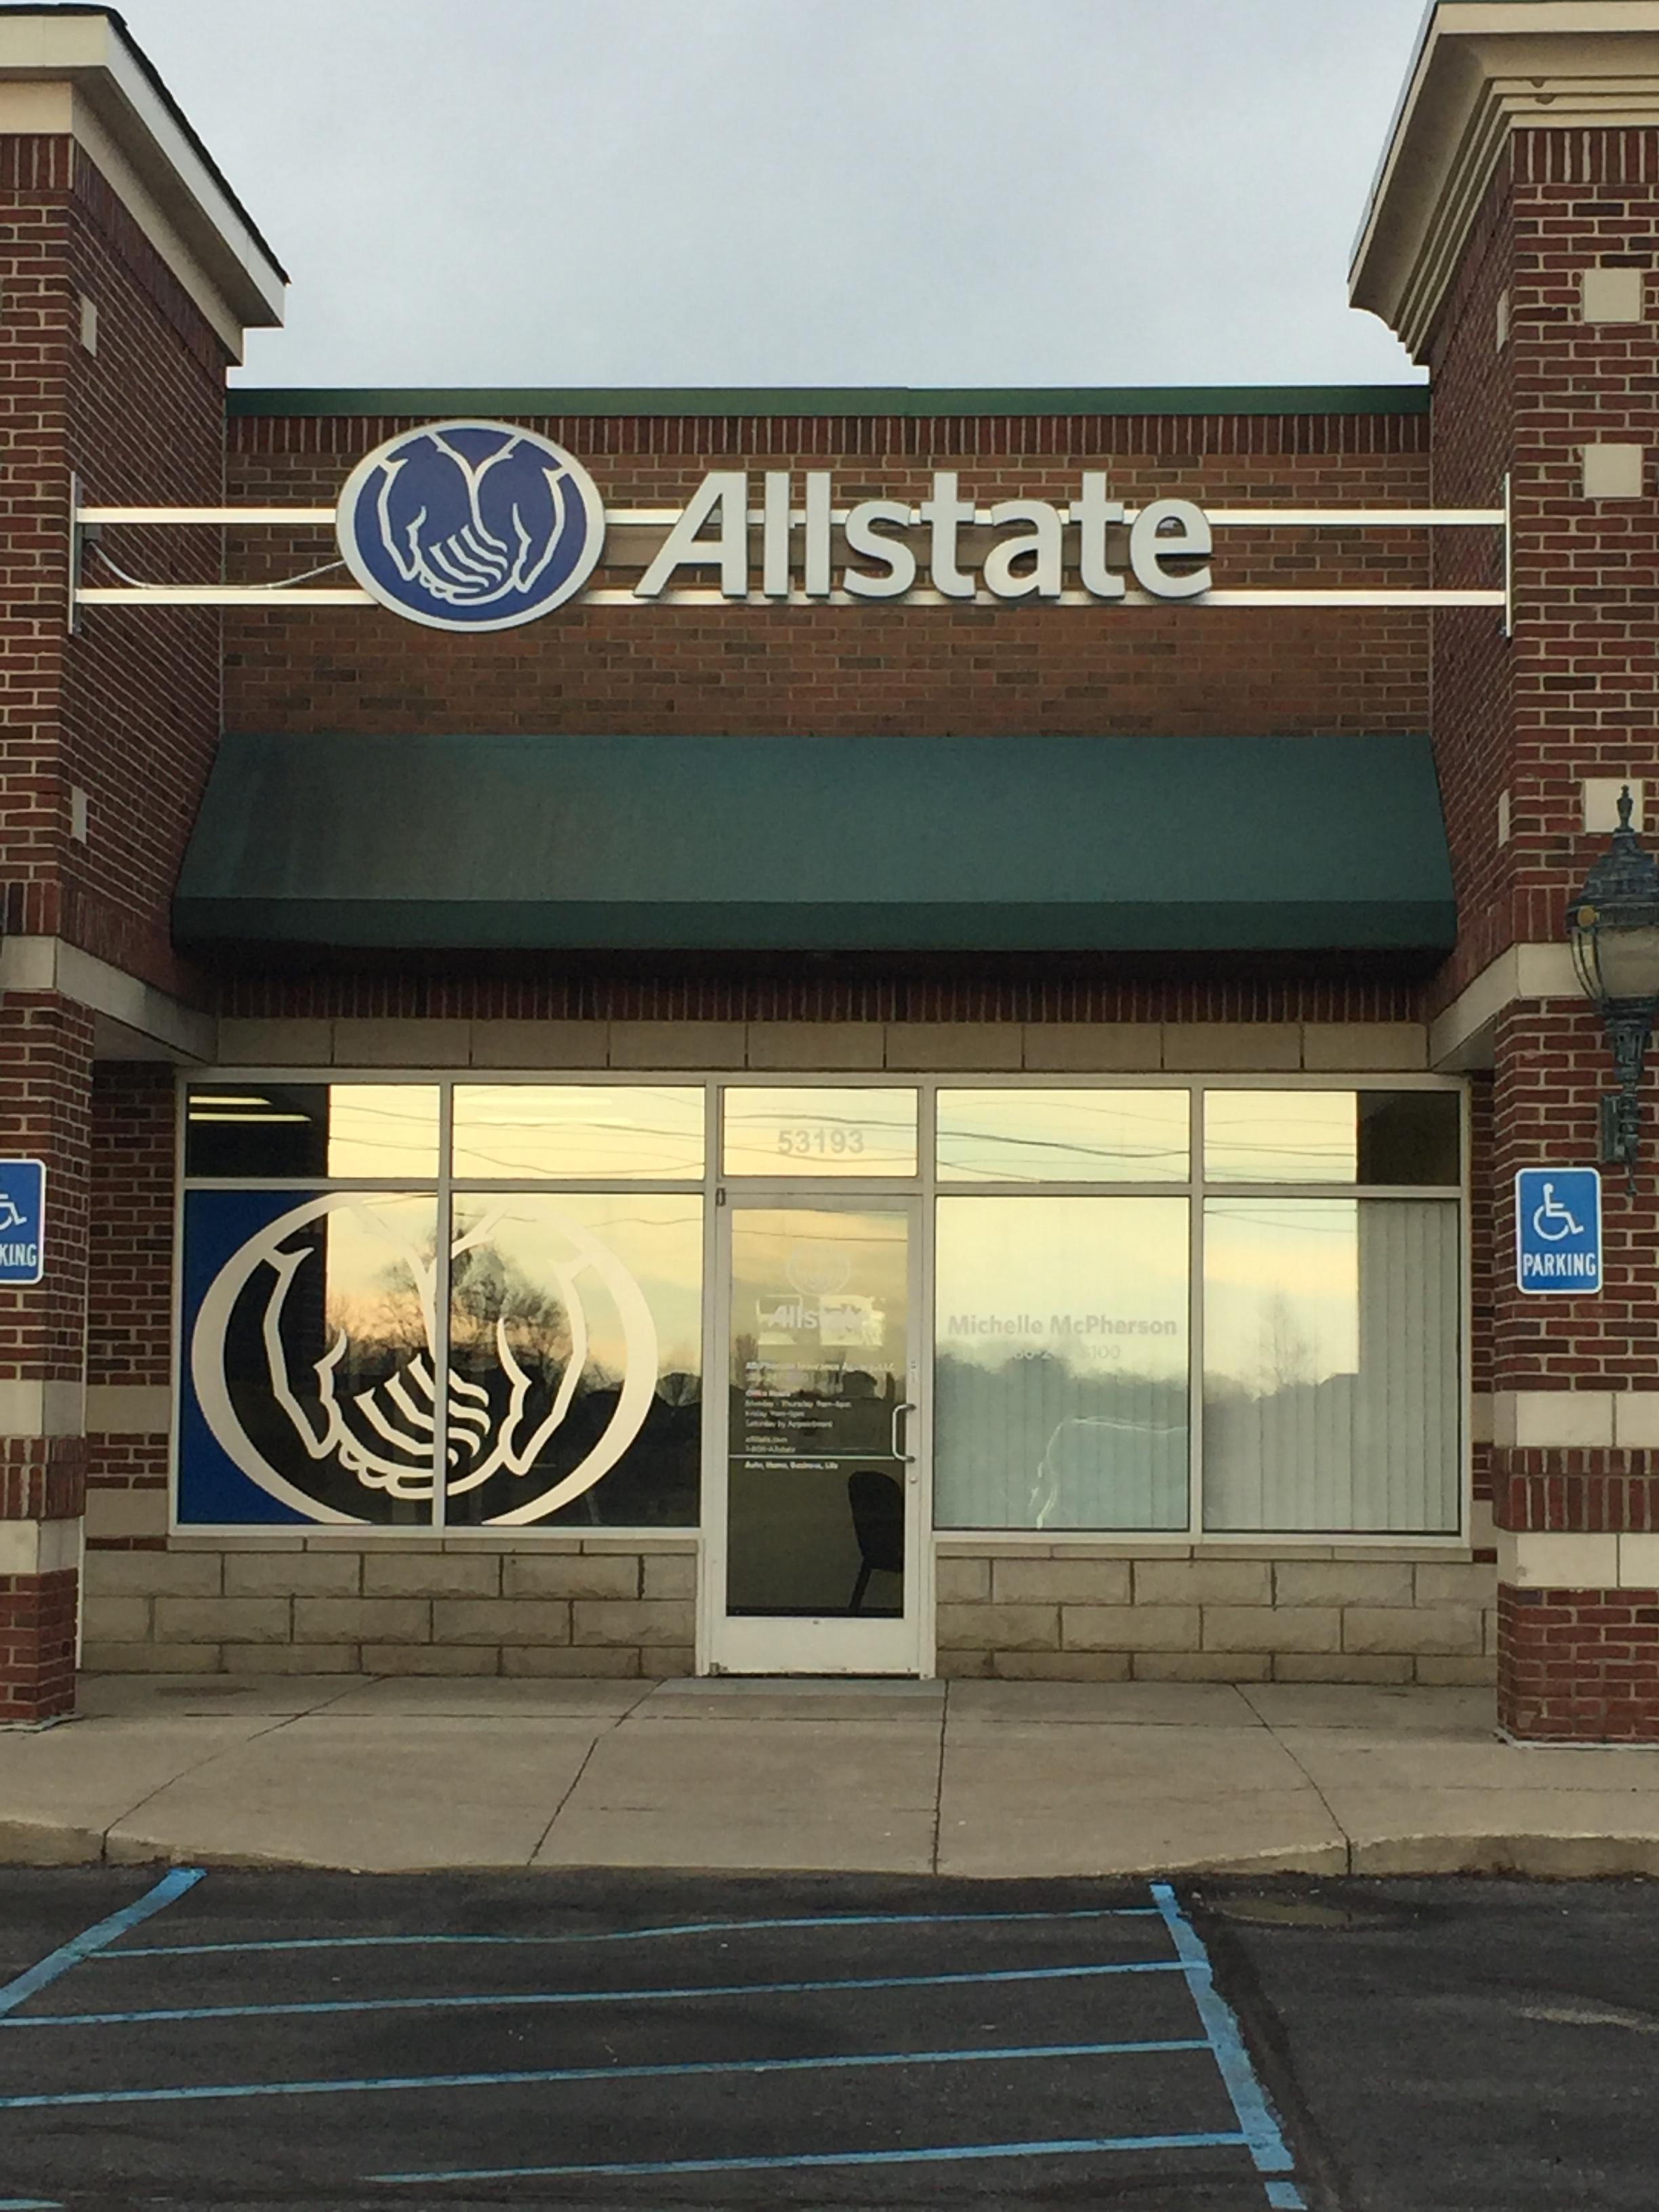 Allstate Insurance Agent: Michelle McPherson image 1